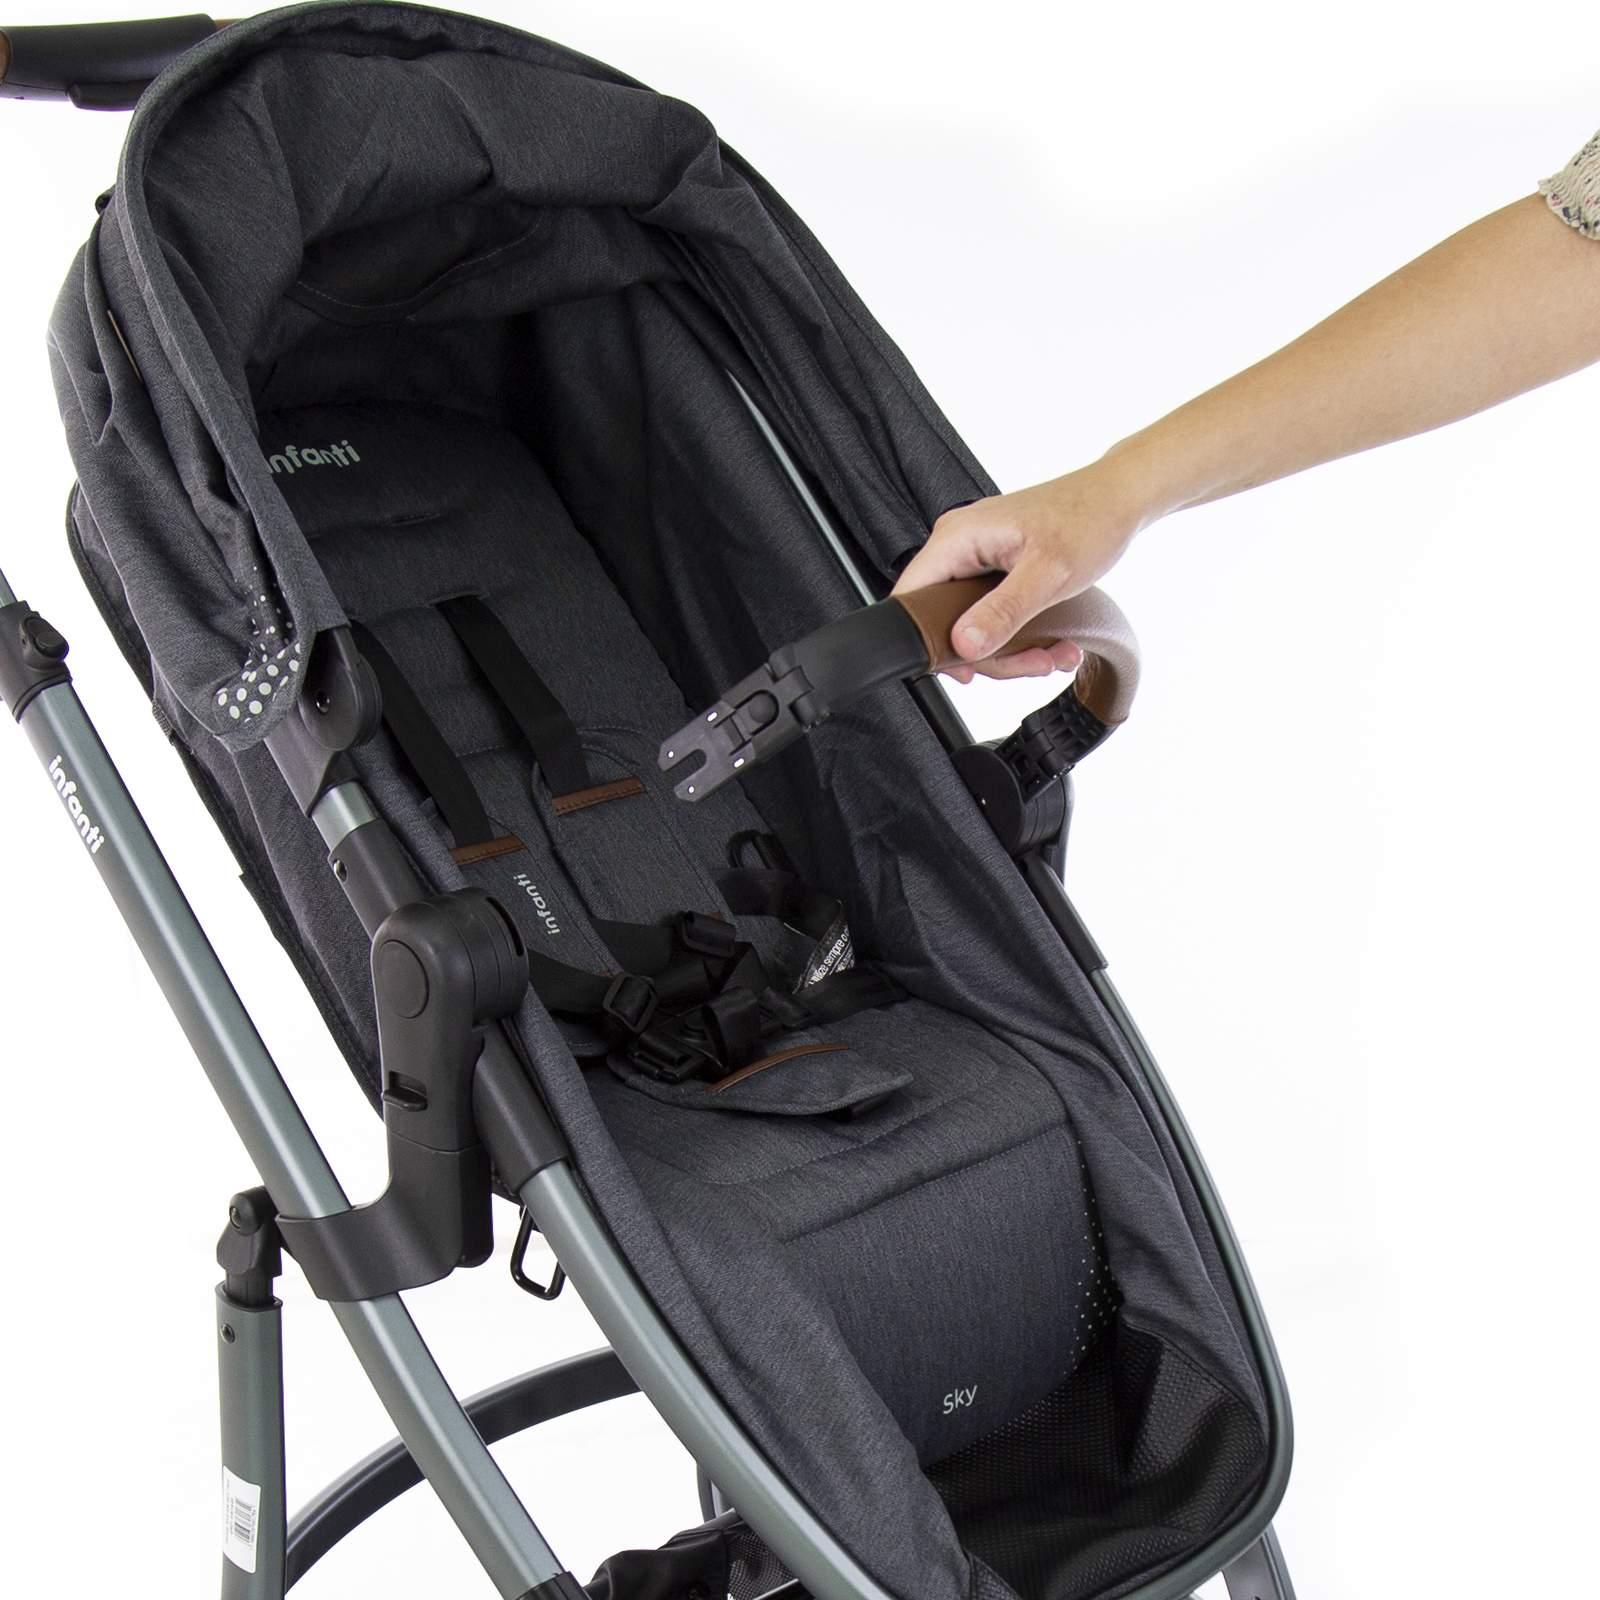 CARRINHO DE BEBÊ SKY GREY VINTAGE + BEBÊ CONFORTO NARNI + BASE VEICULAR - INFANTI